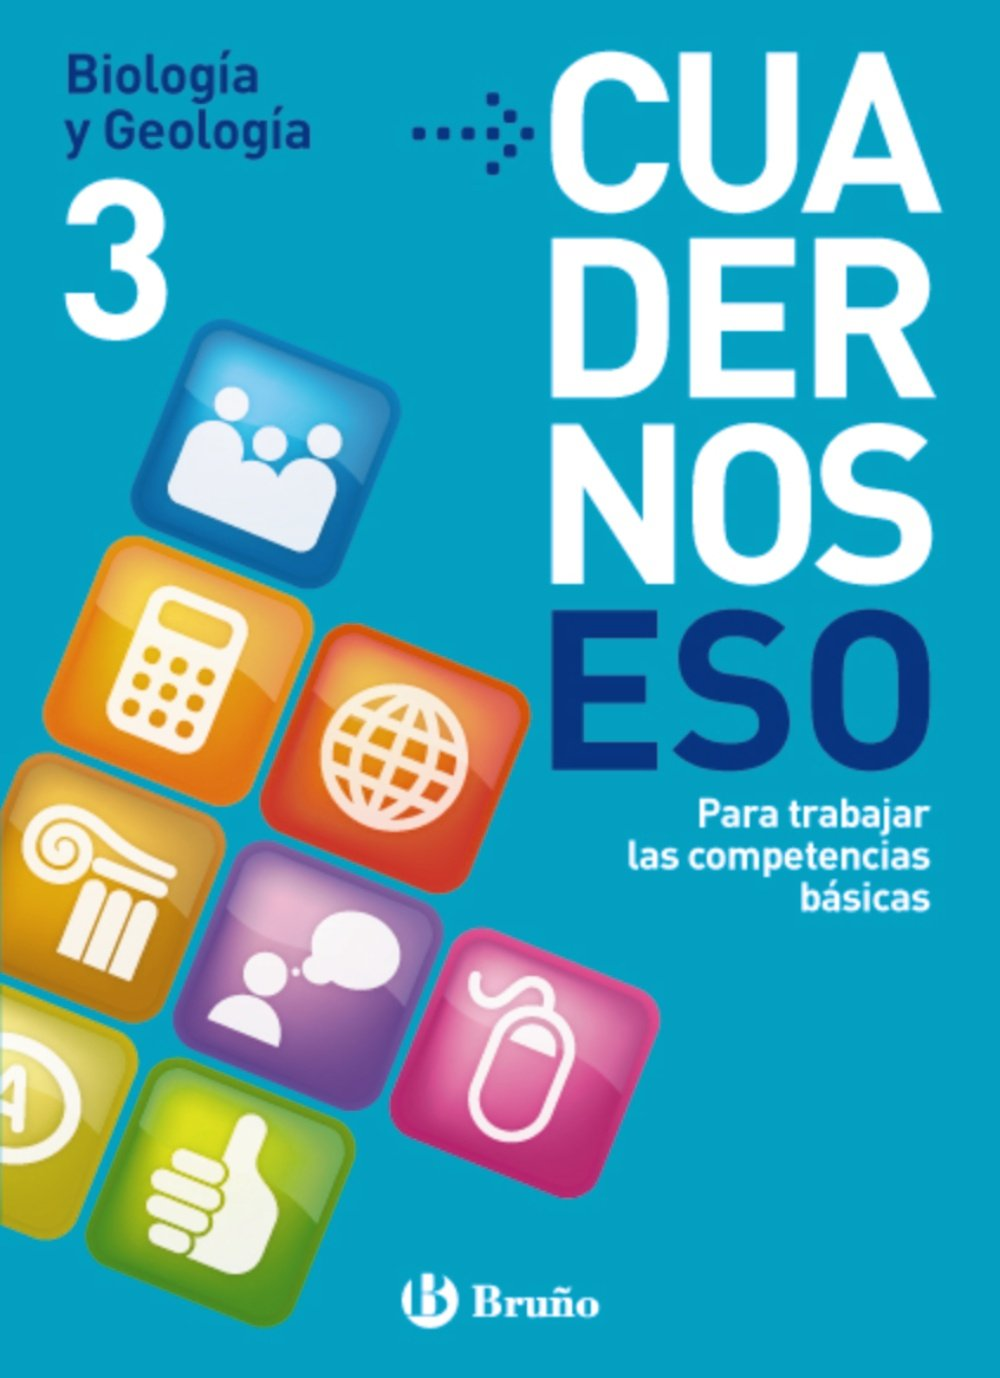 Cuadernos ESO Biologia y Geologia 3 (Spanish Edition) pdf